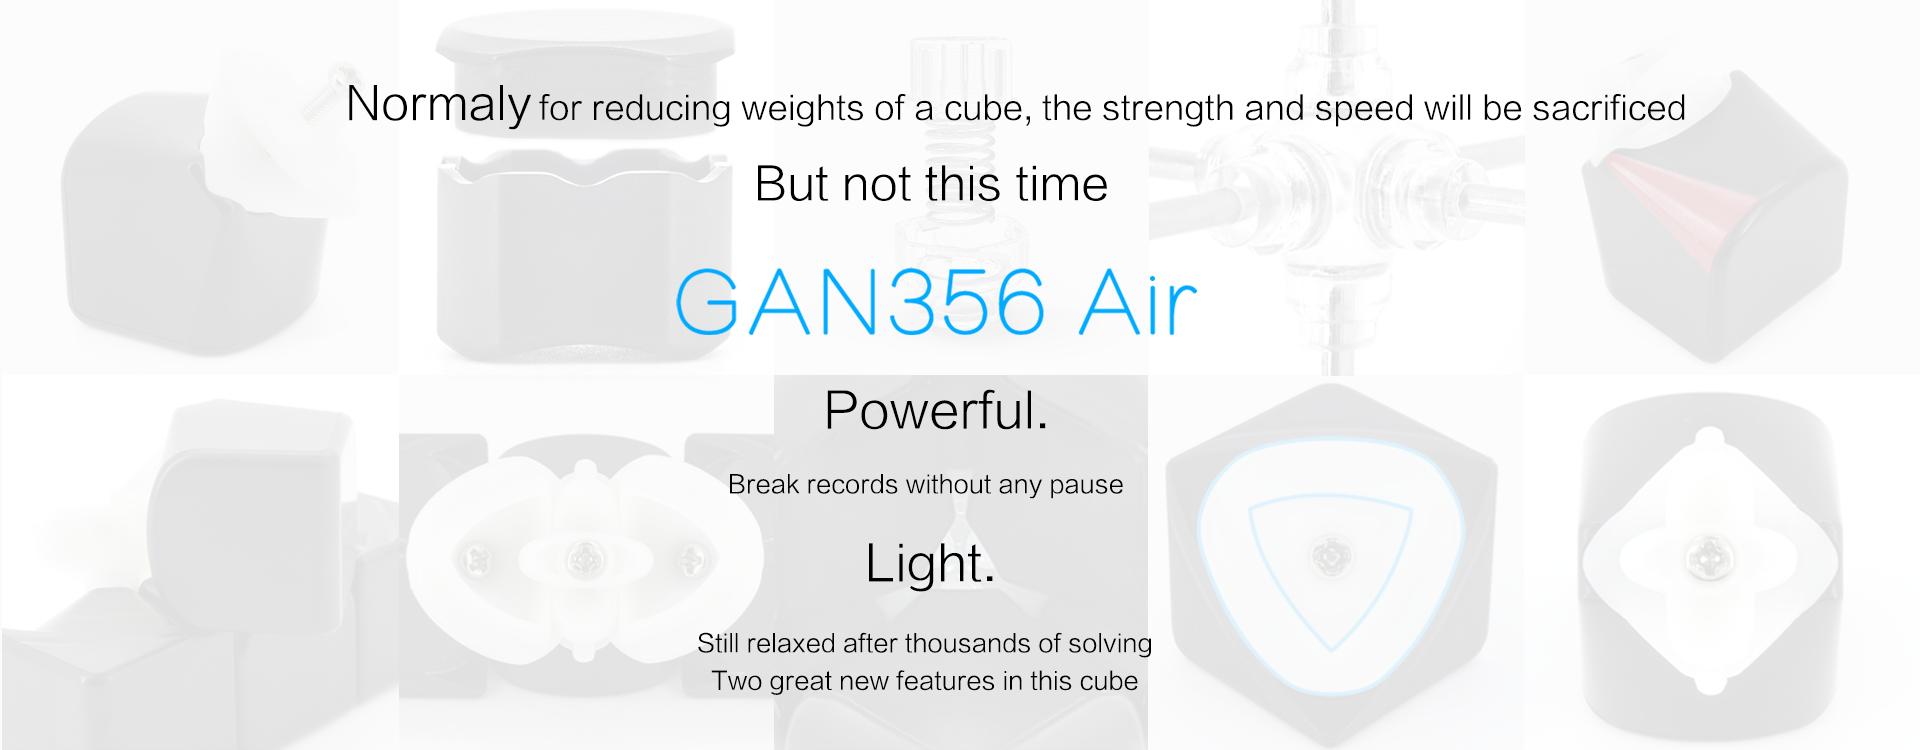 GAN356-Air-图文详情_02